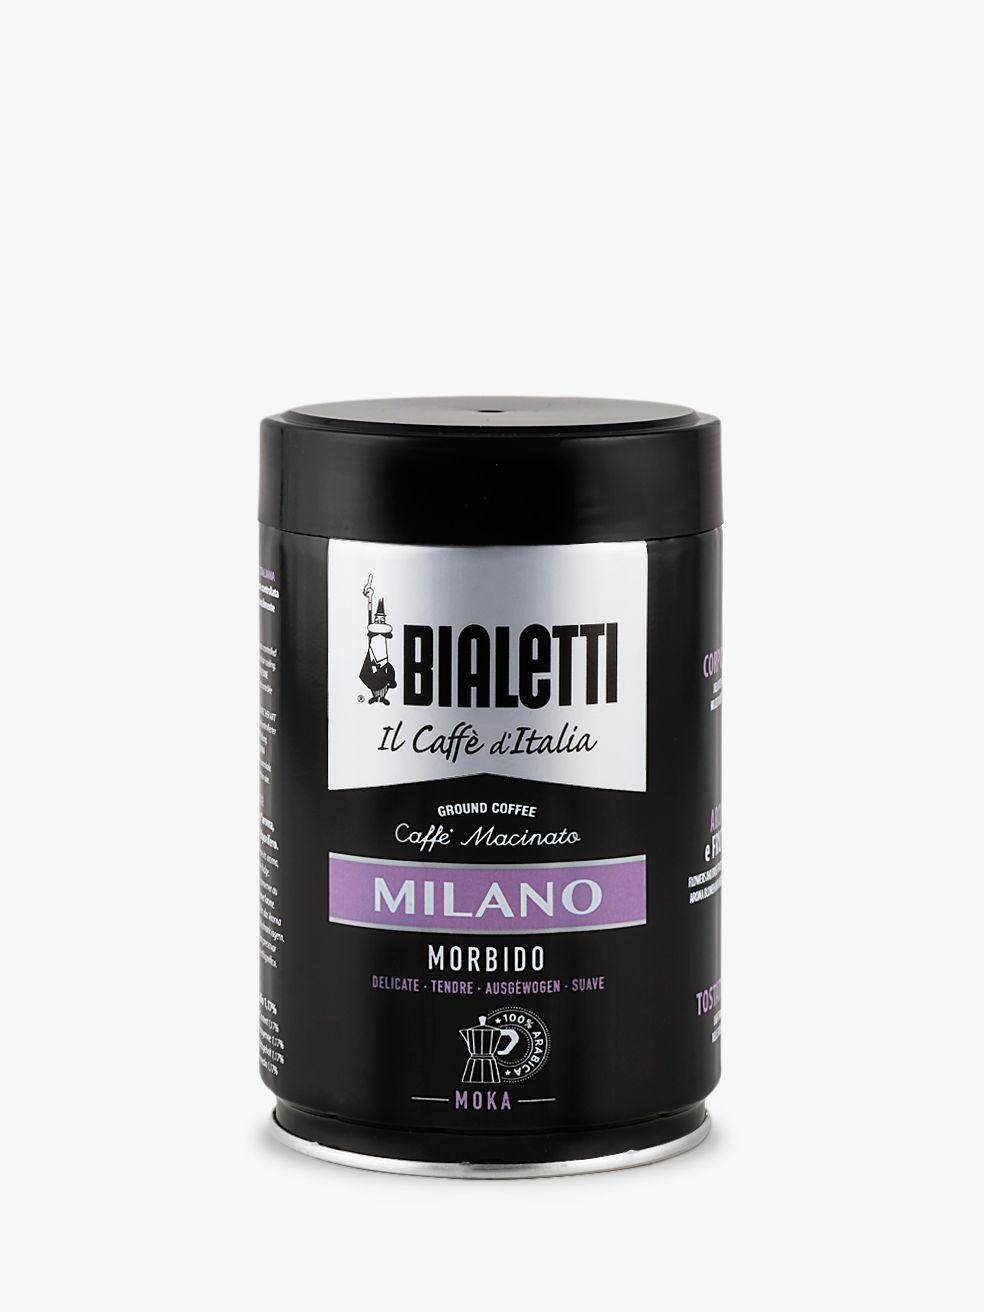 Bialetti Bialetti Milano Ground Coffee, 250g